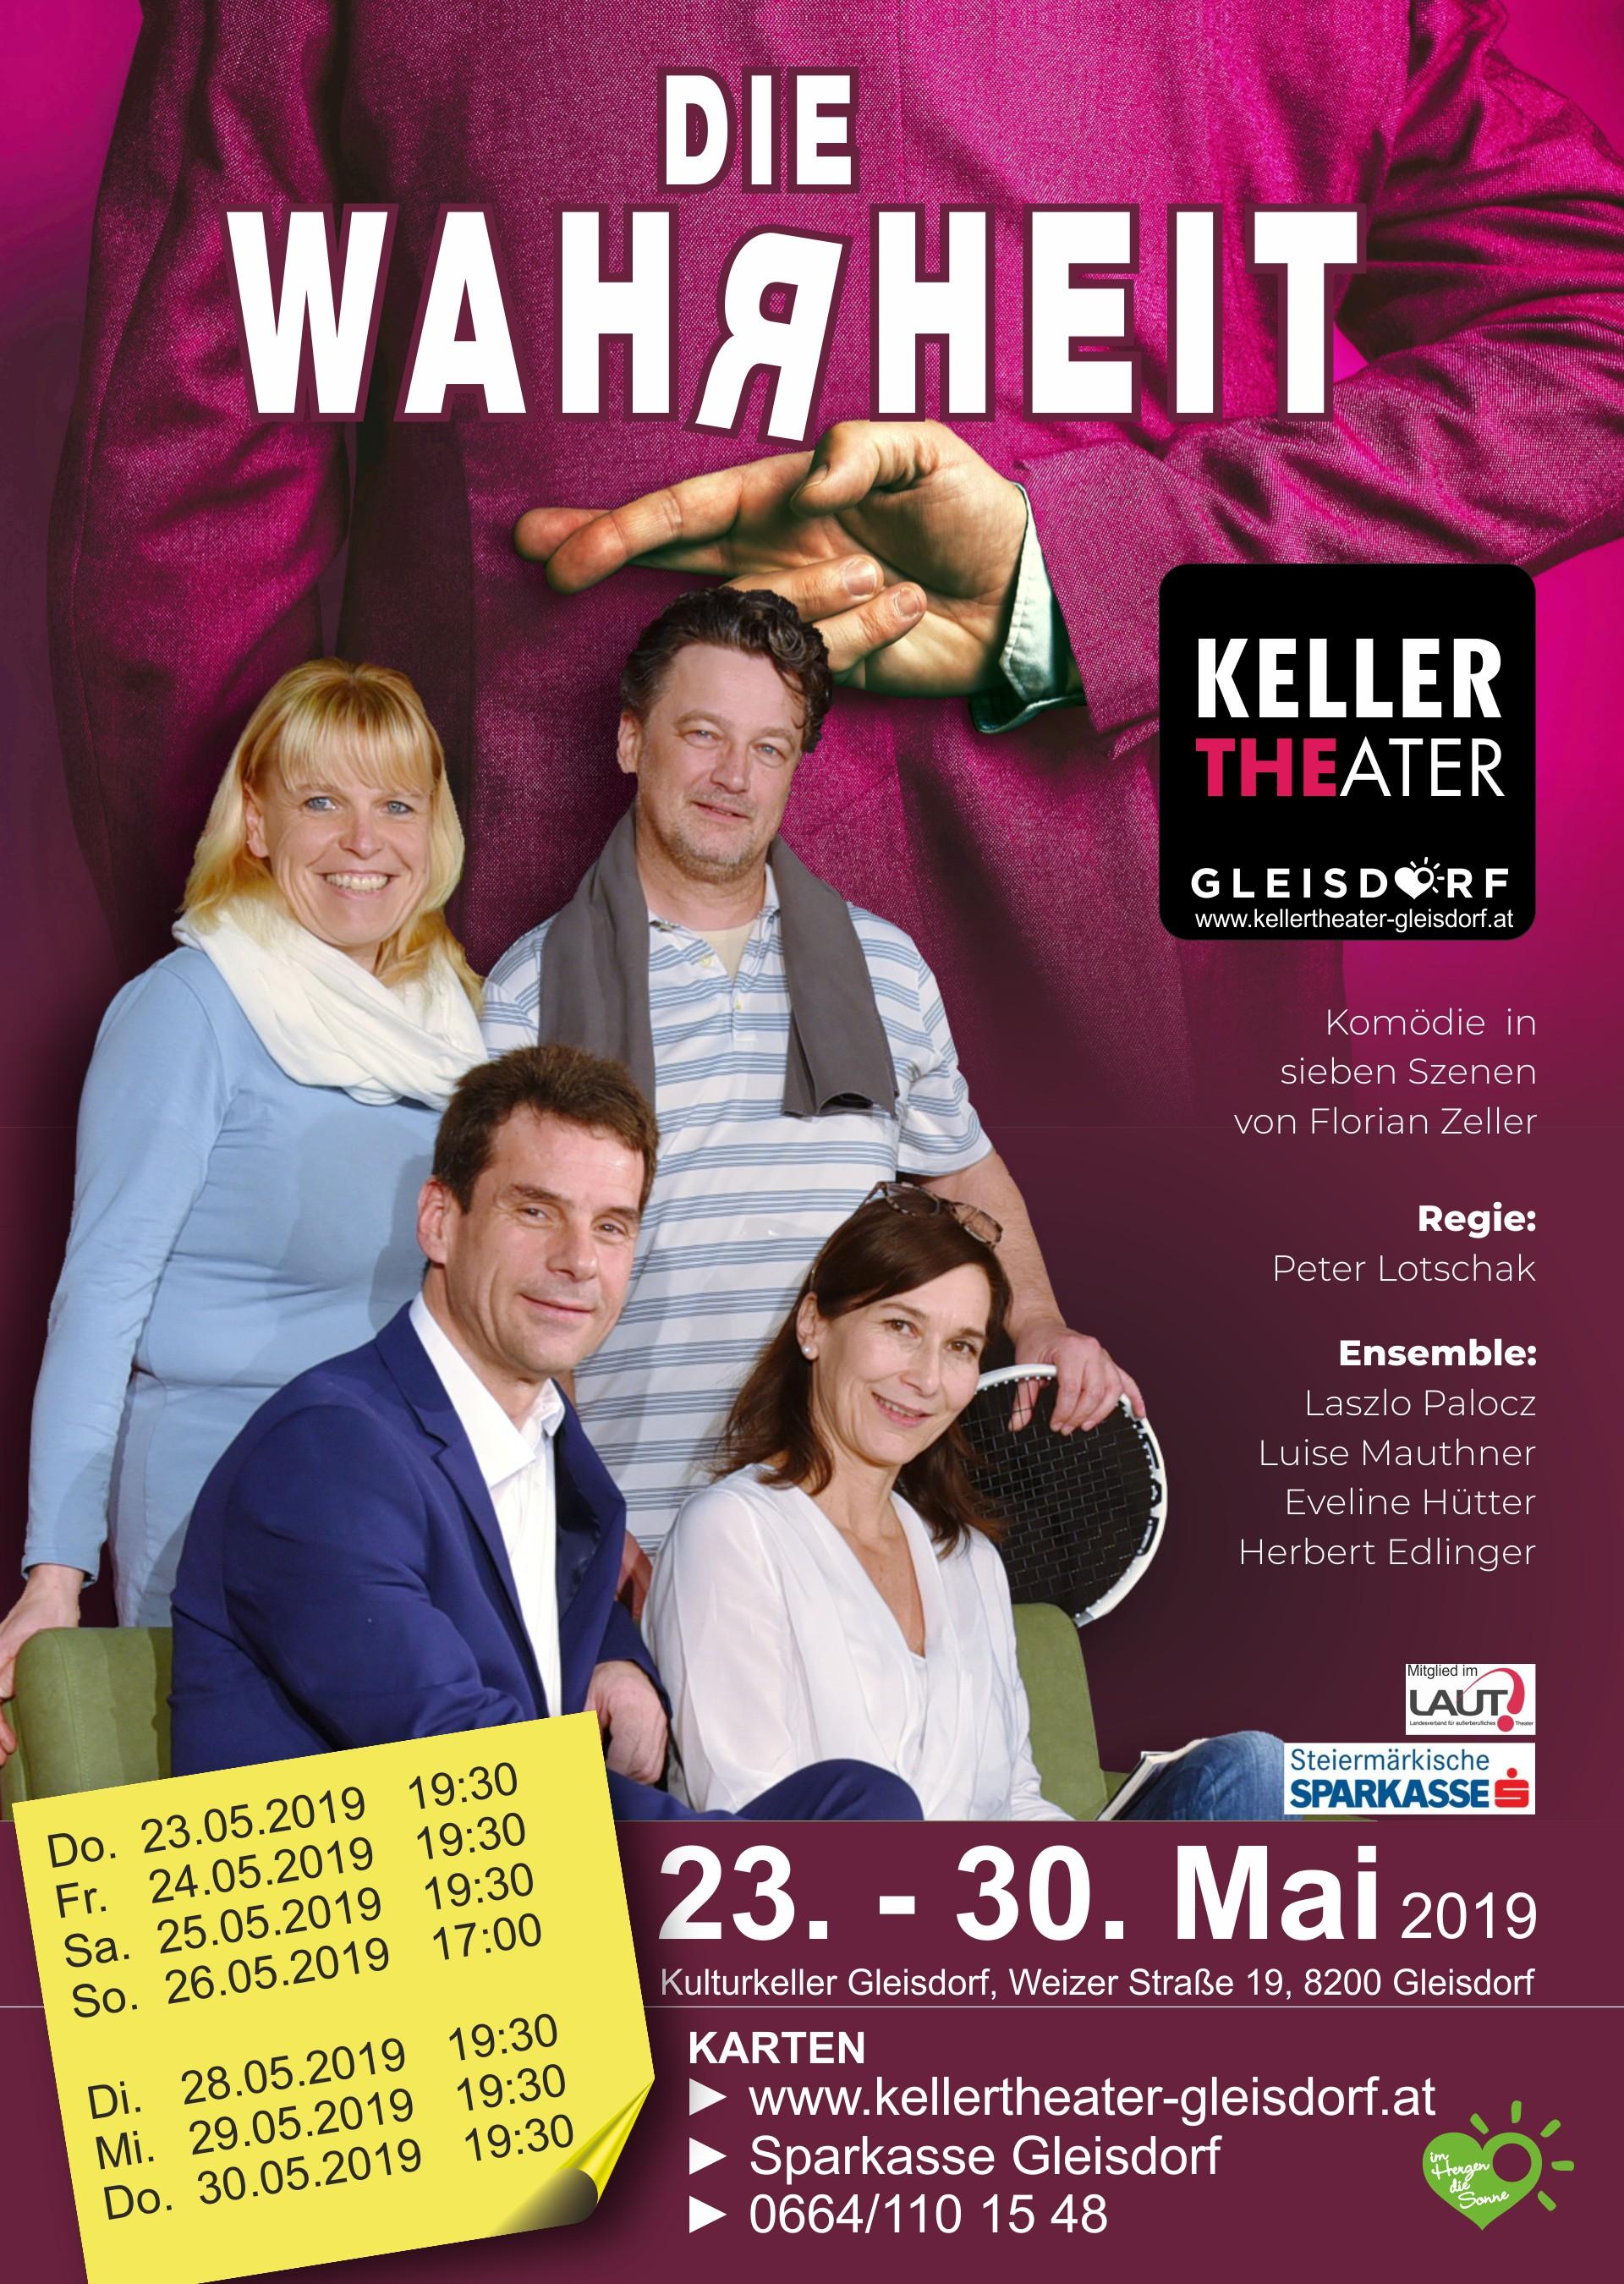 Stadtgemeinde Gleisdorf Job-Brse